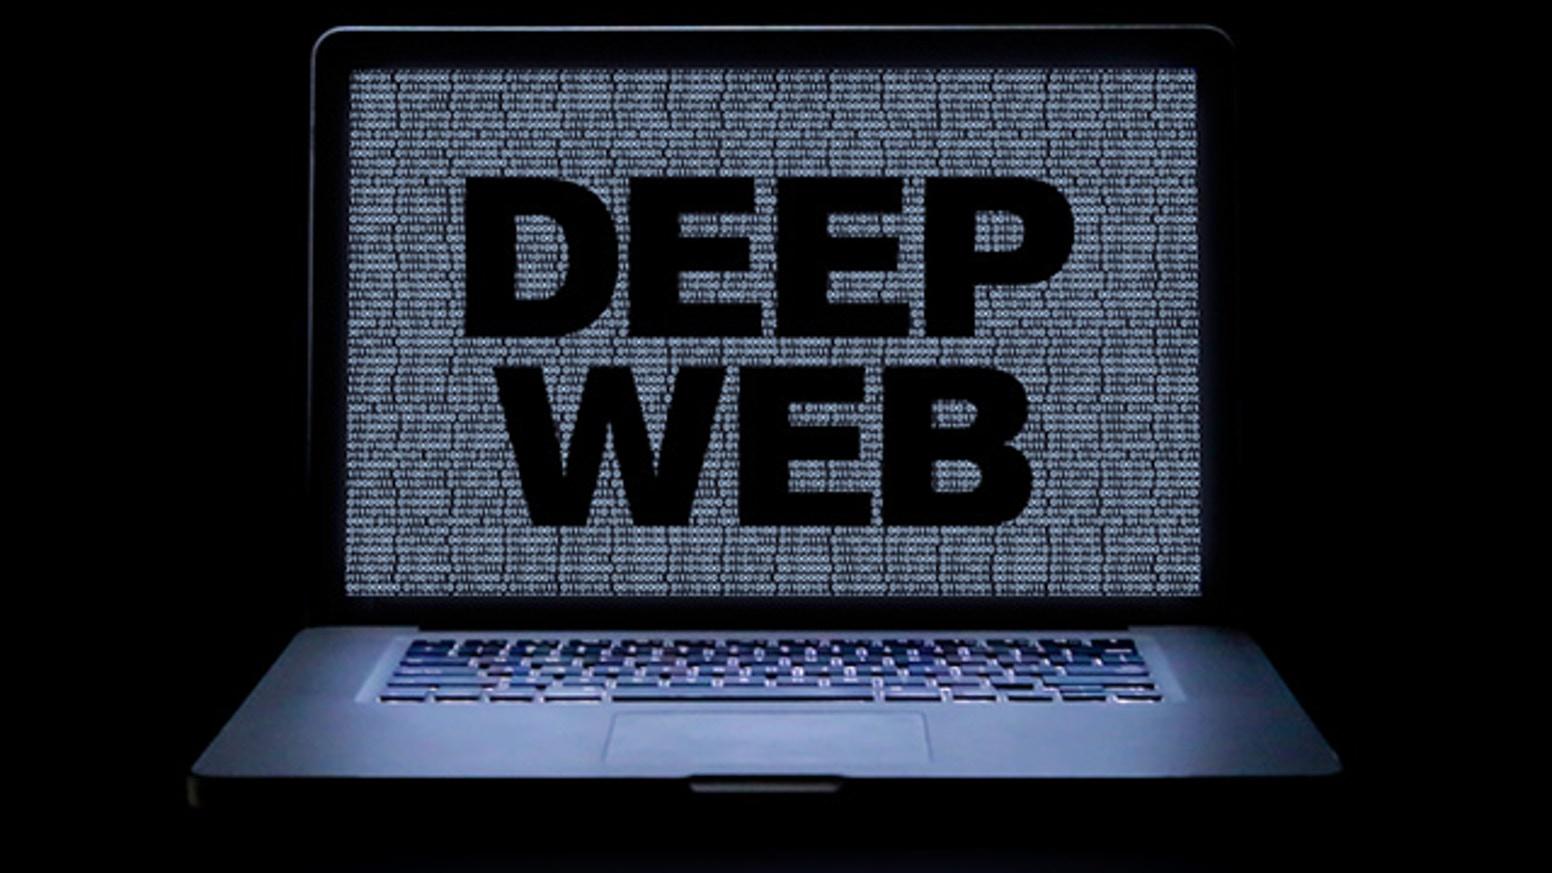 Create a Hidden Service Tor Site, an Anonymous Website or Server